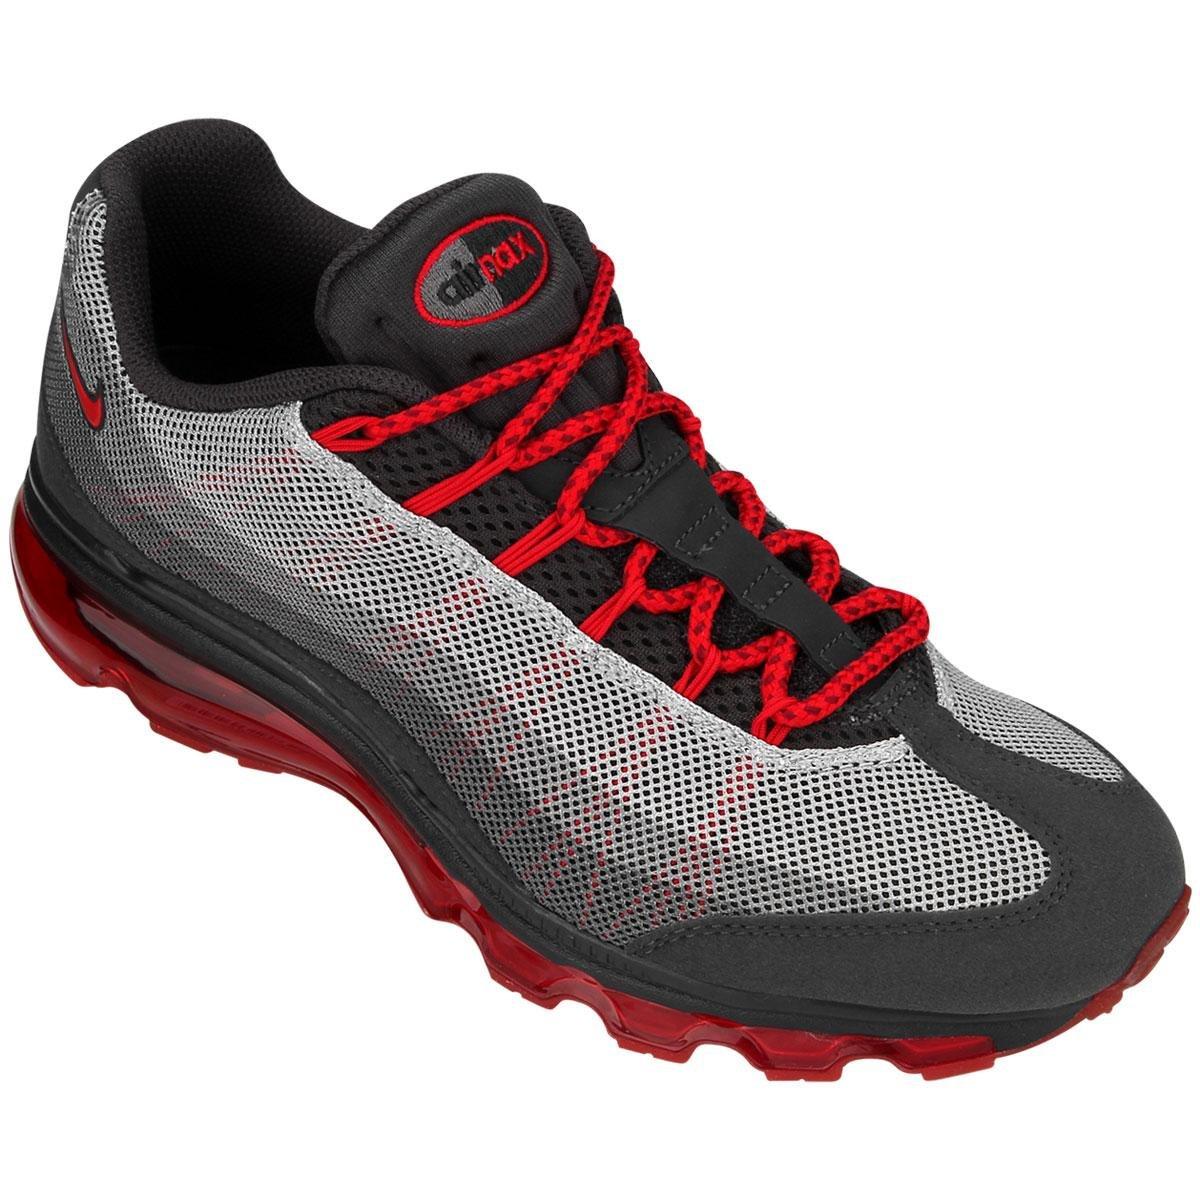 new product 99235 c2fb1 Tênis Nike Air Max 95 Dyn Fw - Compre Agora  Netshoes